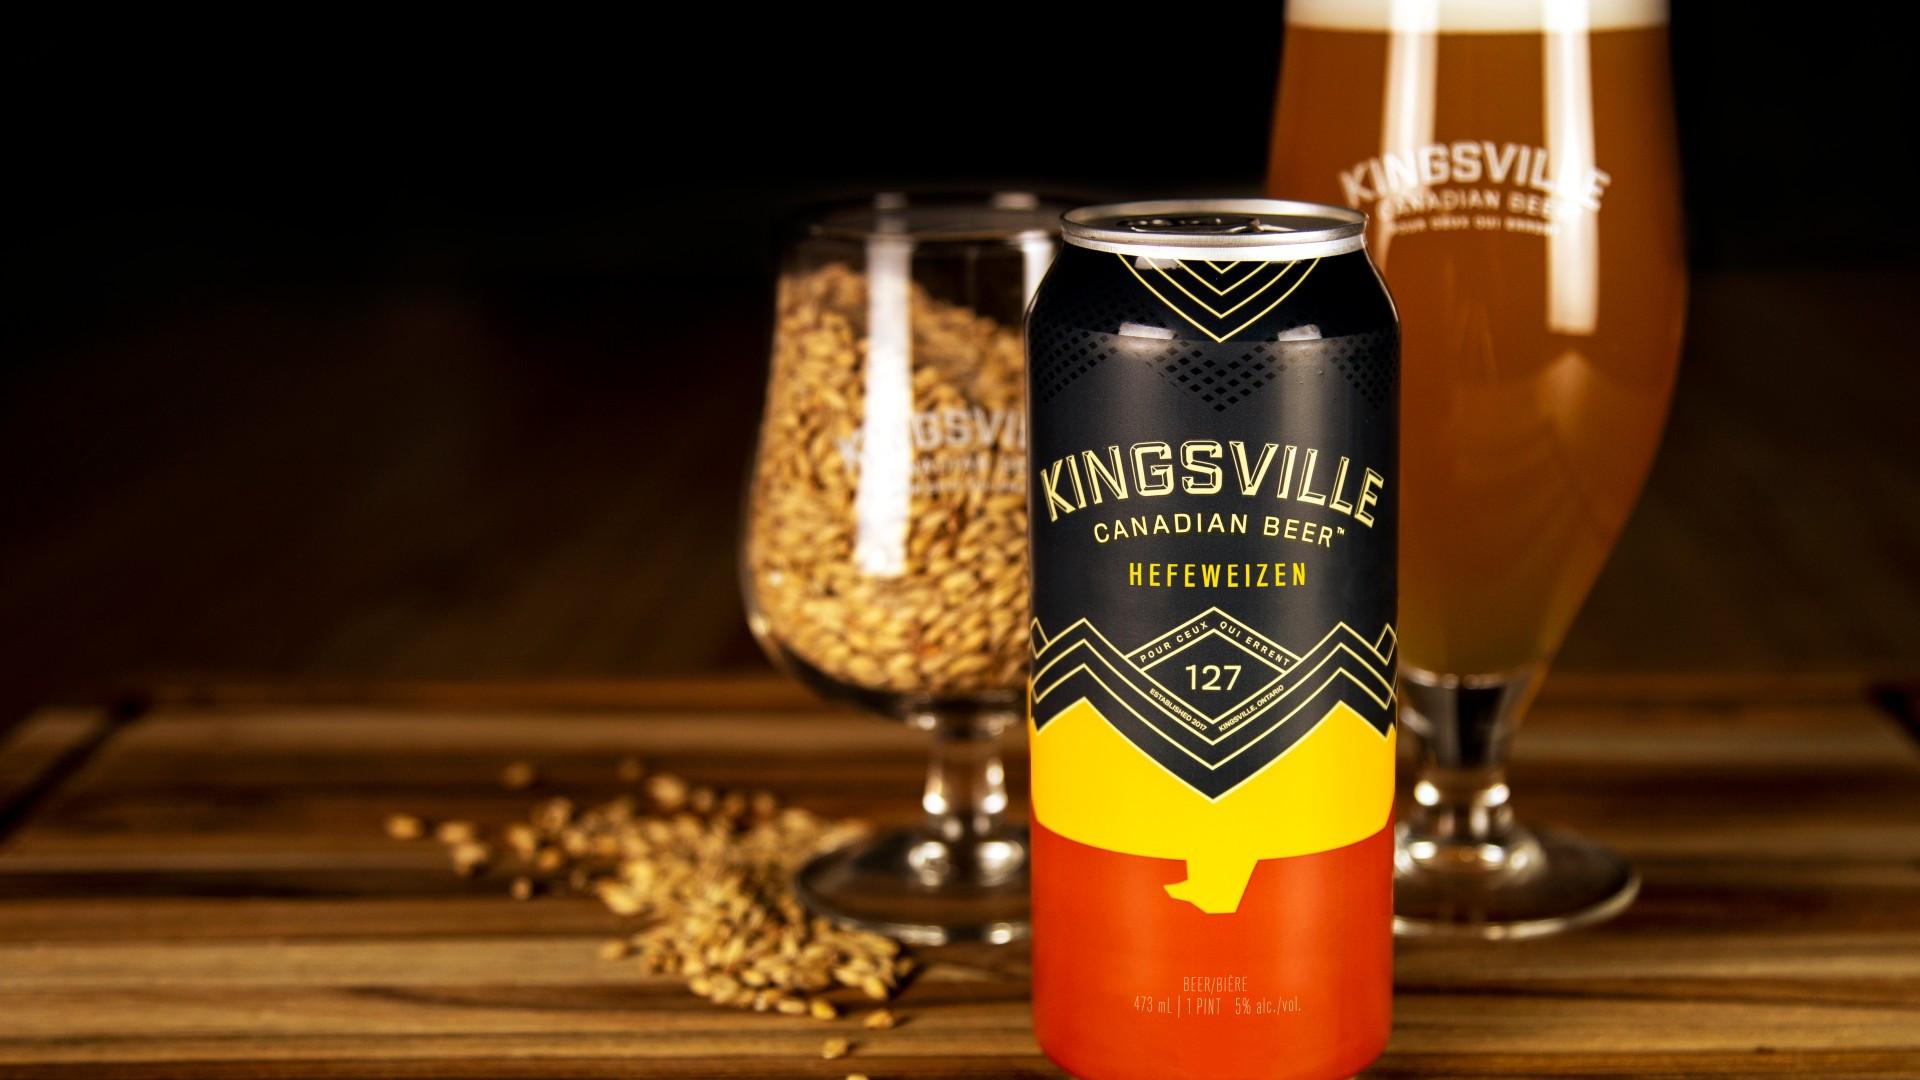 Kingsville Brewery | Hefeweizen